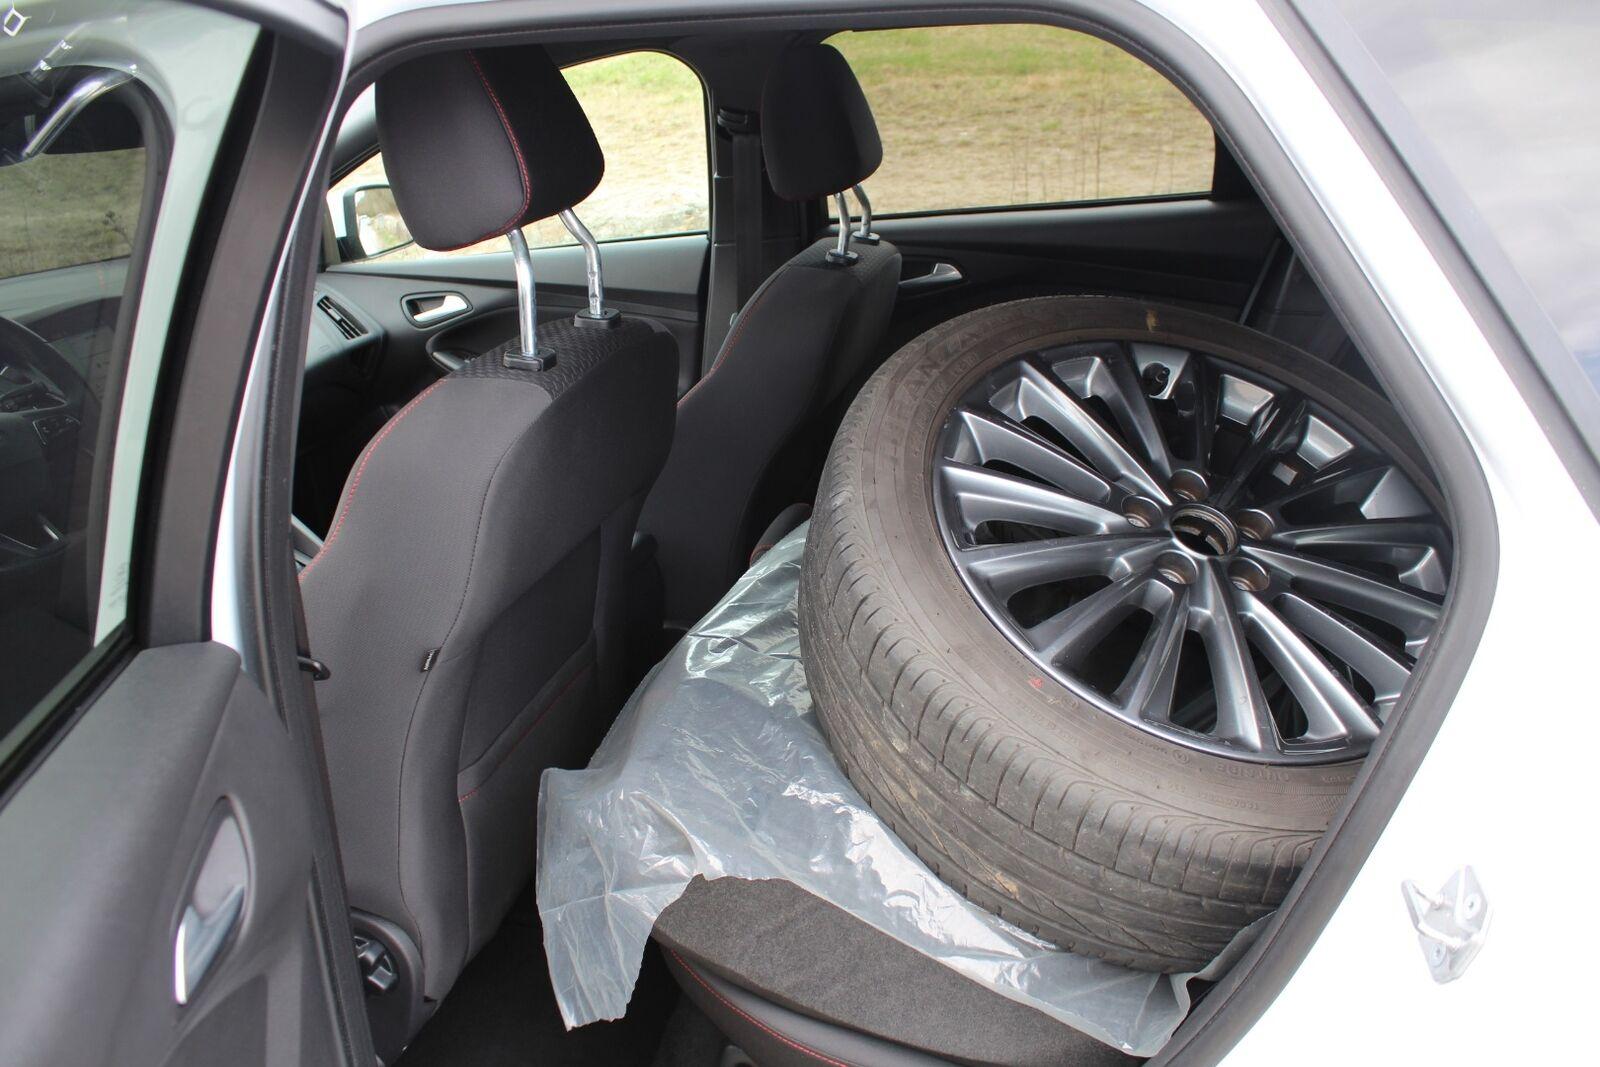 Ford Focus 1,5 TDCi 120 ST-Line stc. aut. - billede 10